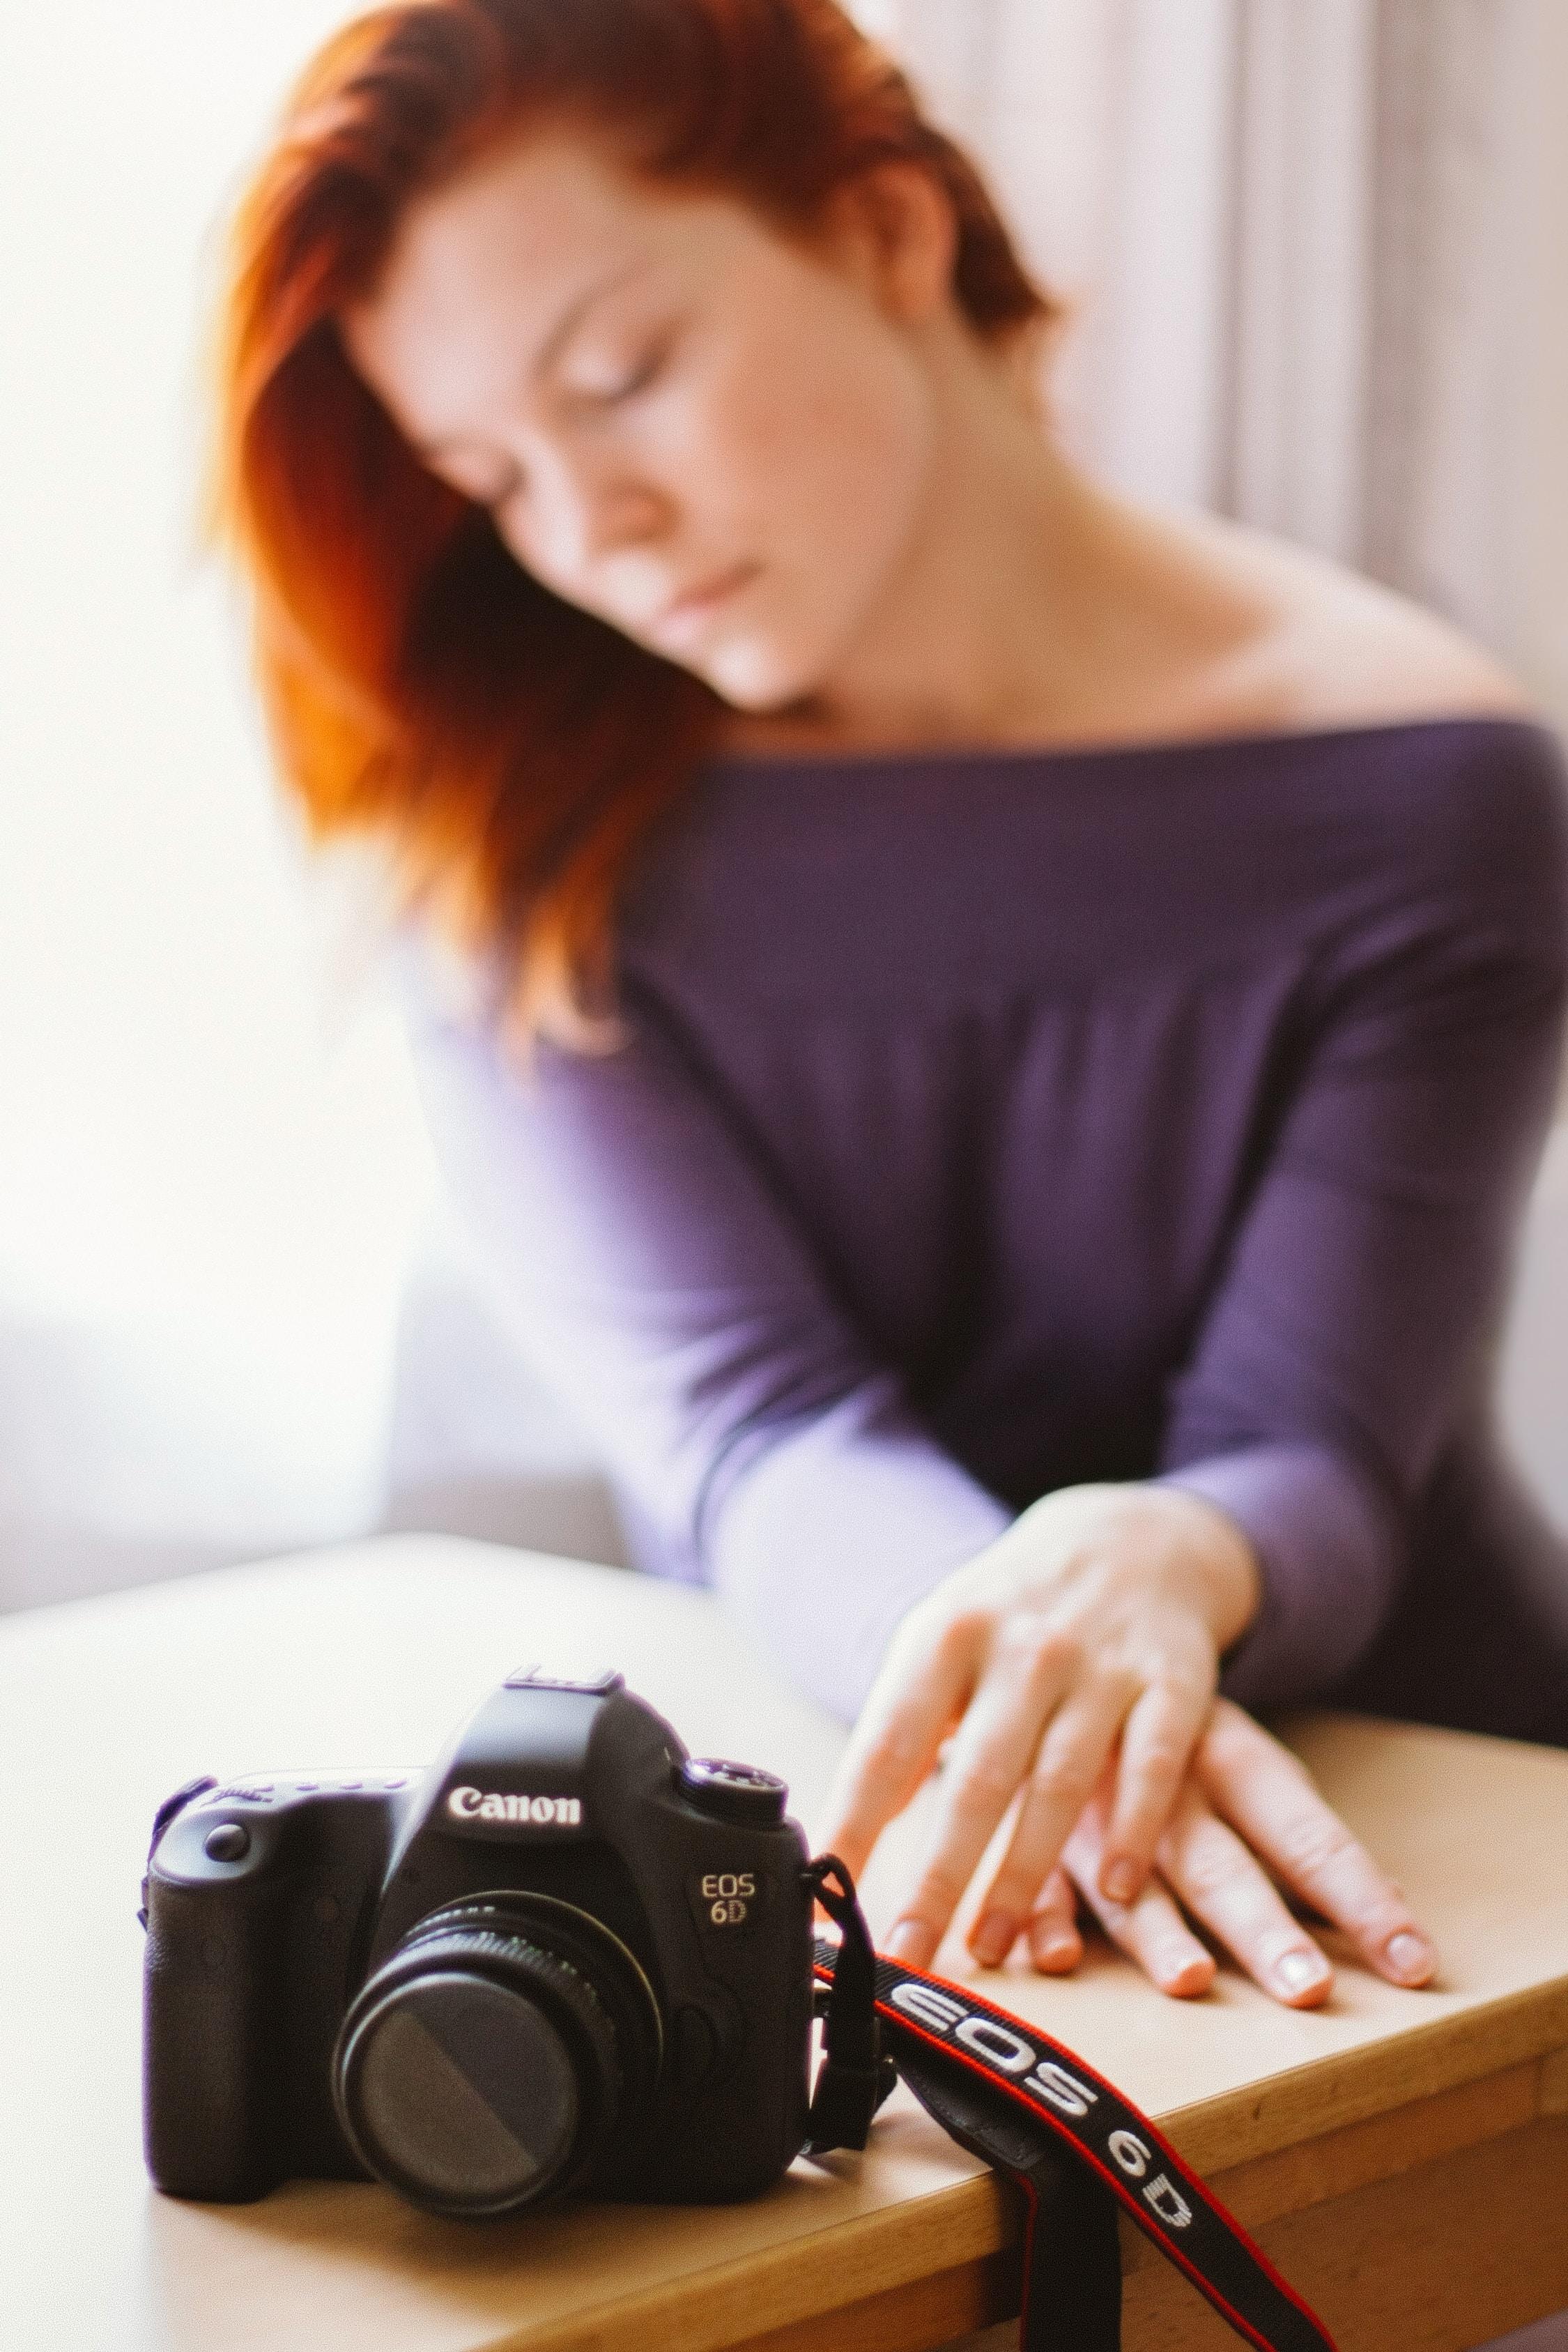 black Canon DSLR camera on table